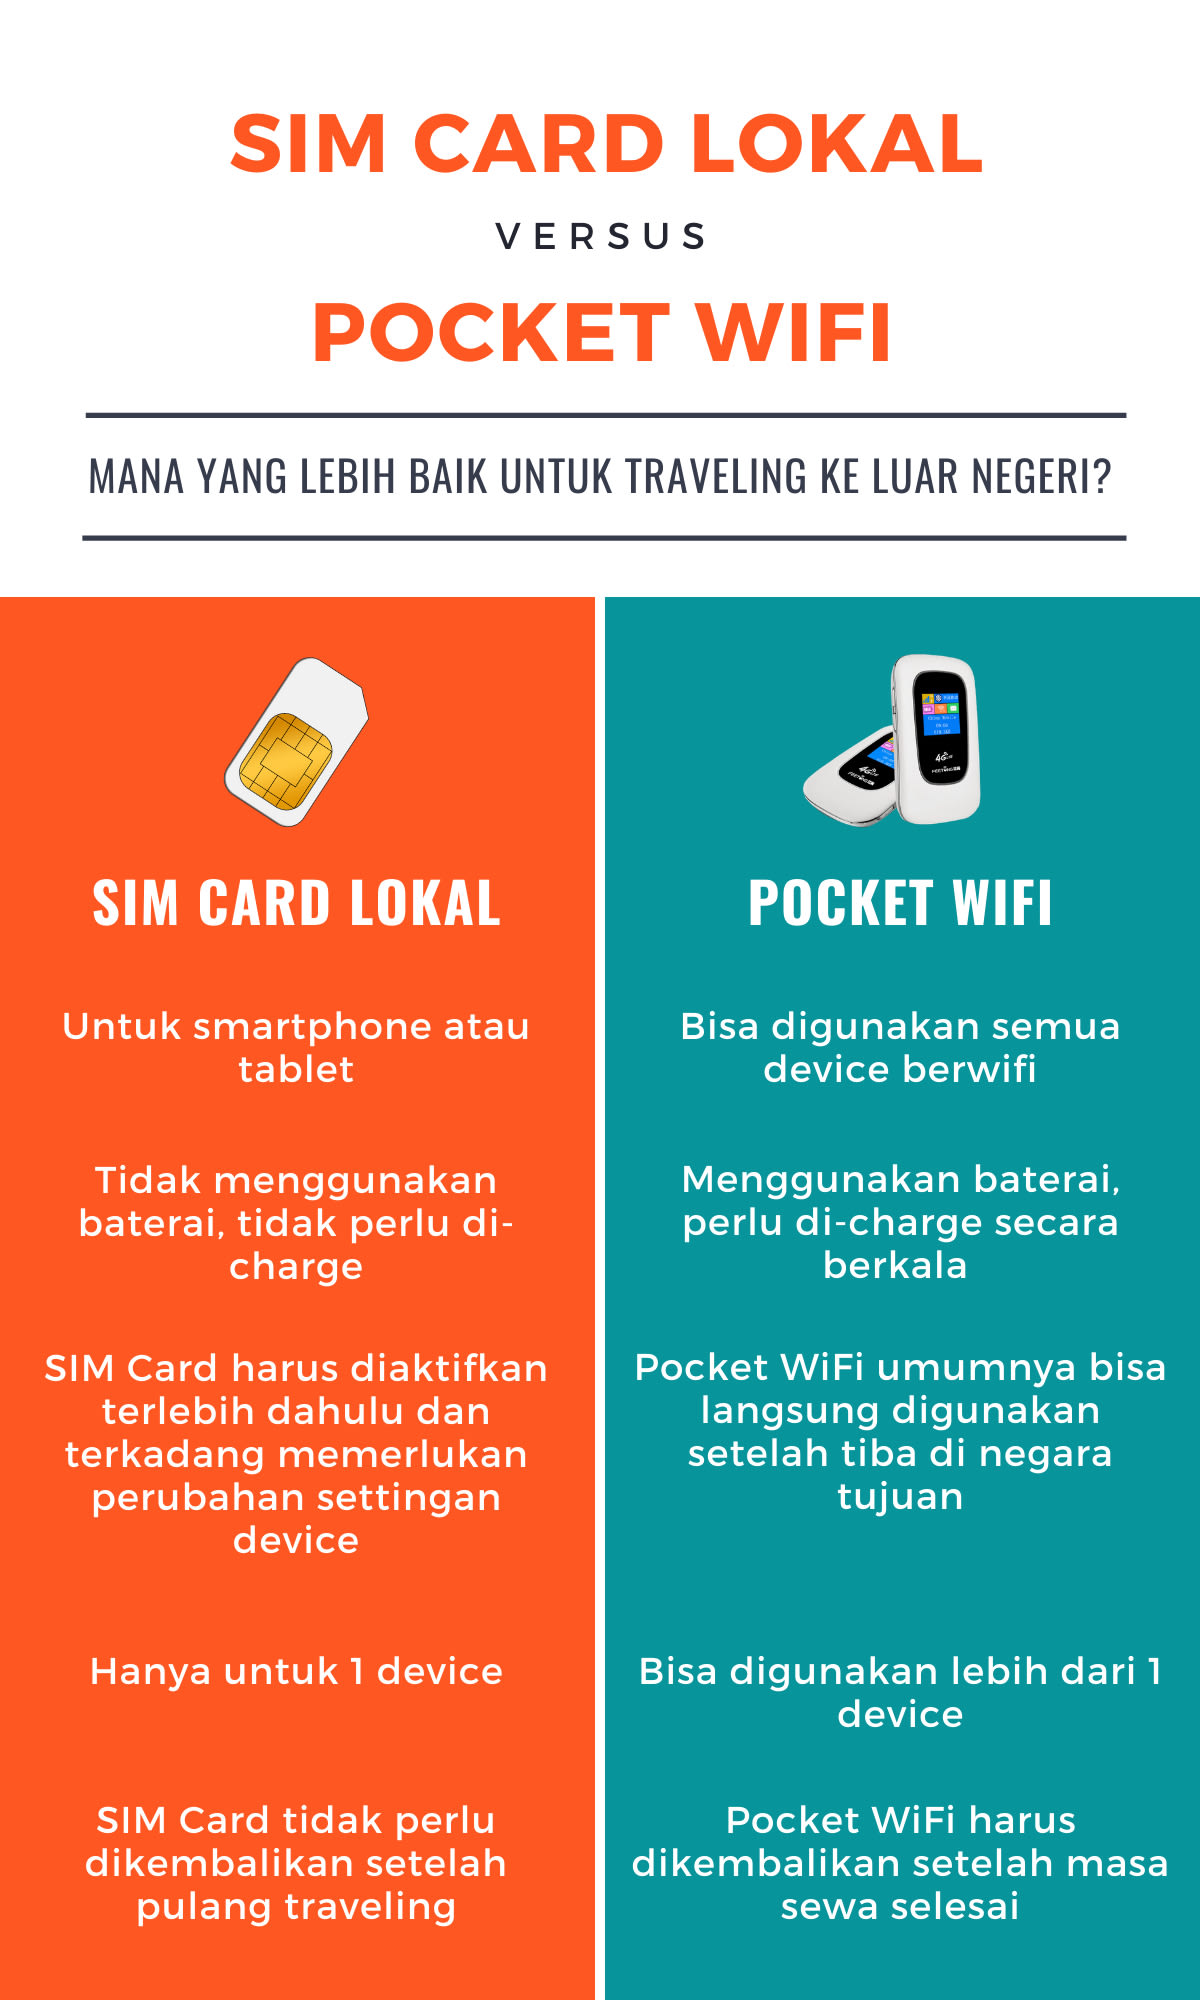 SIM Card vs Pocket WiFi Infographic